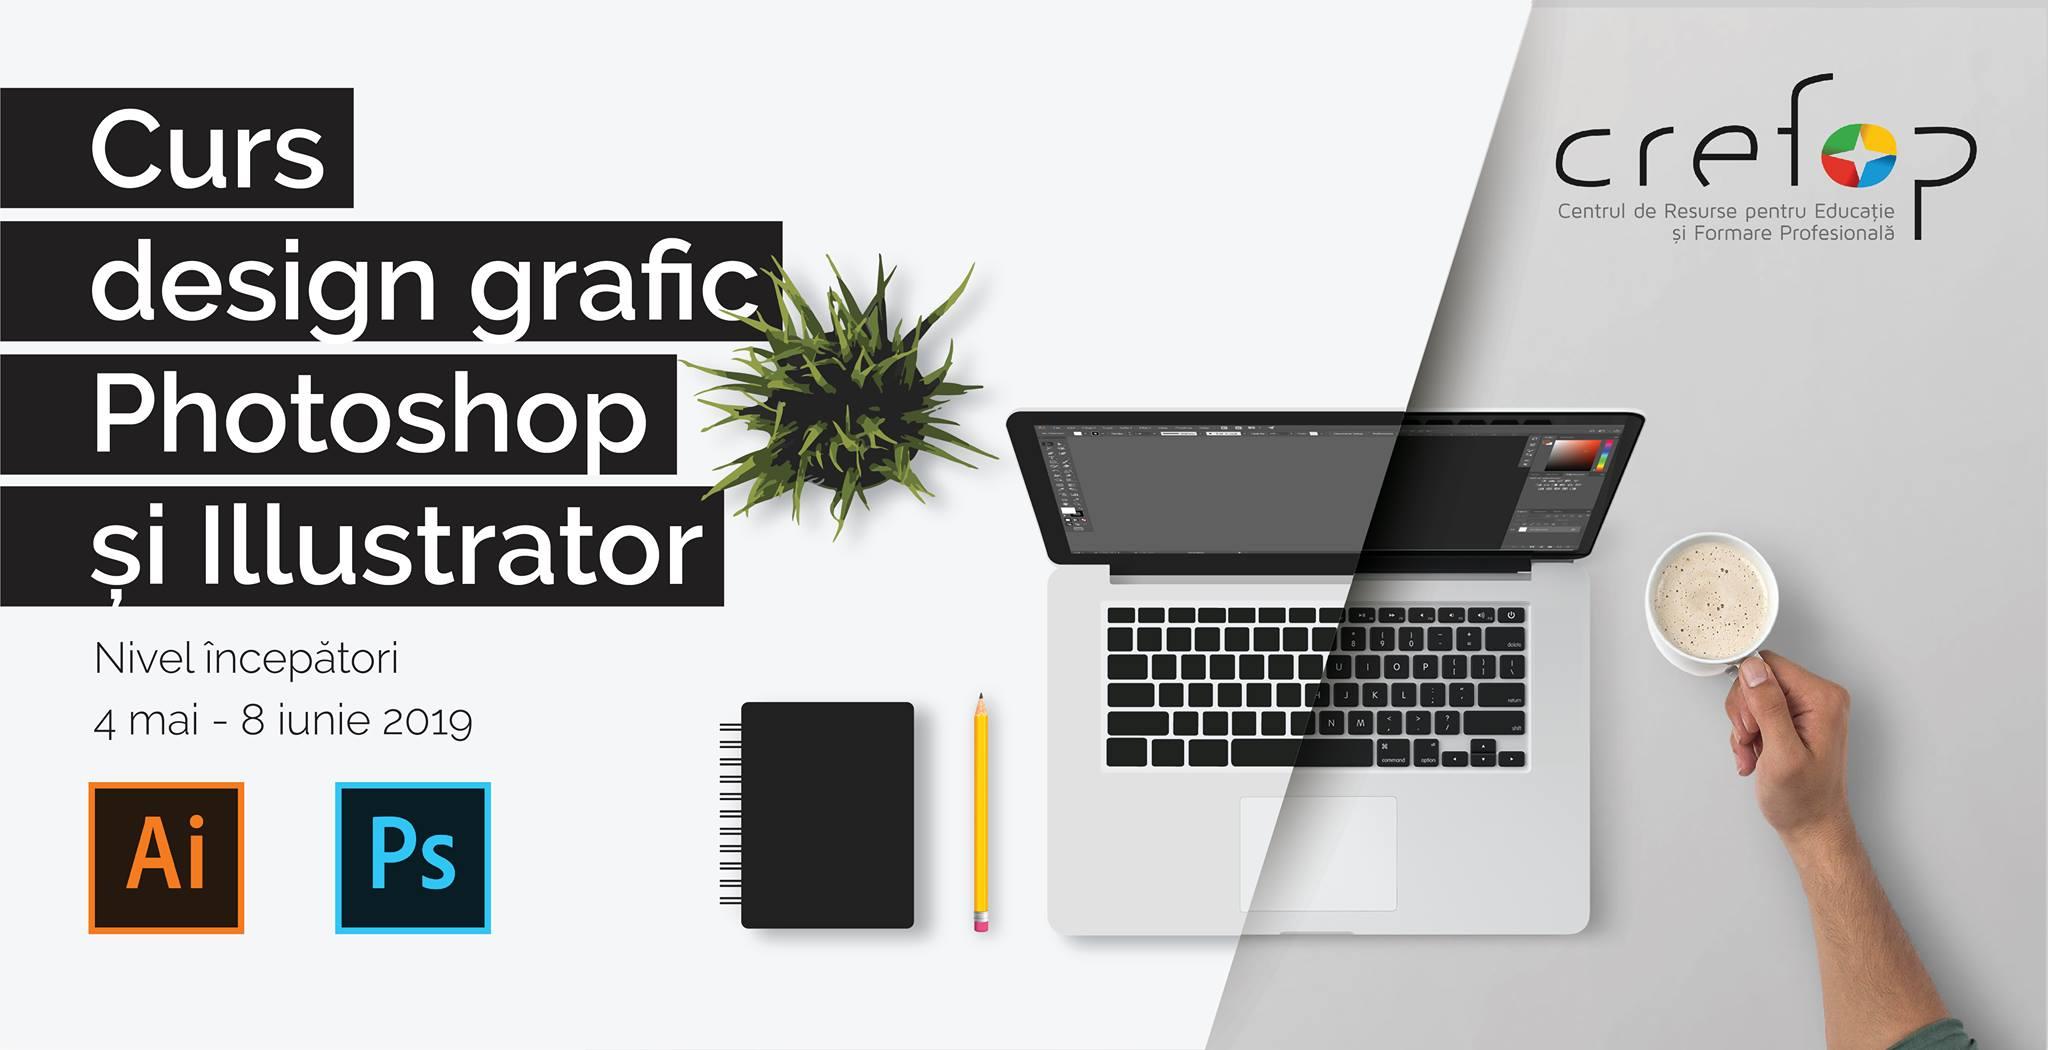 Curs de Grafic Design – Photoshop & Illustrator